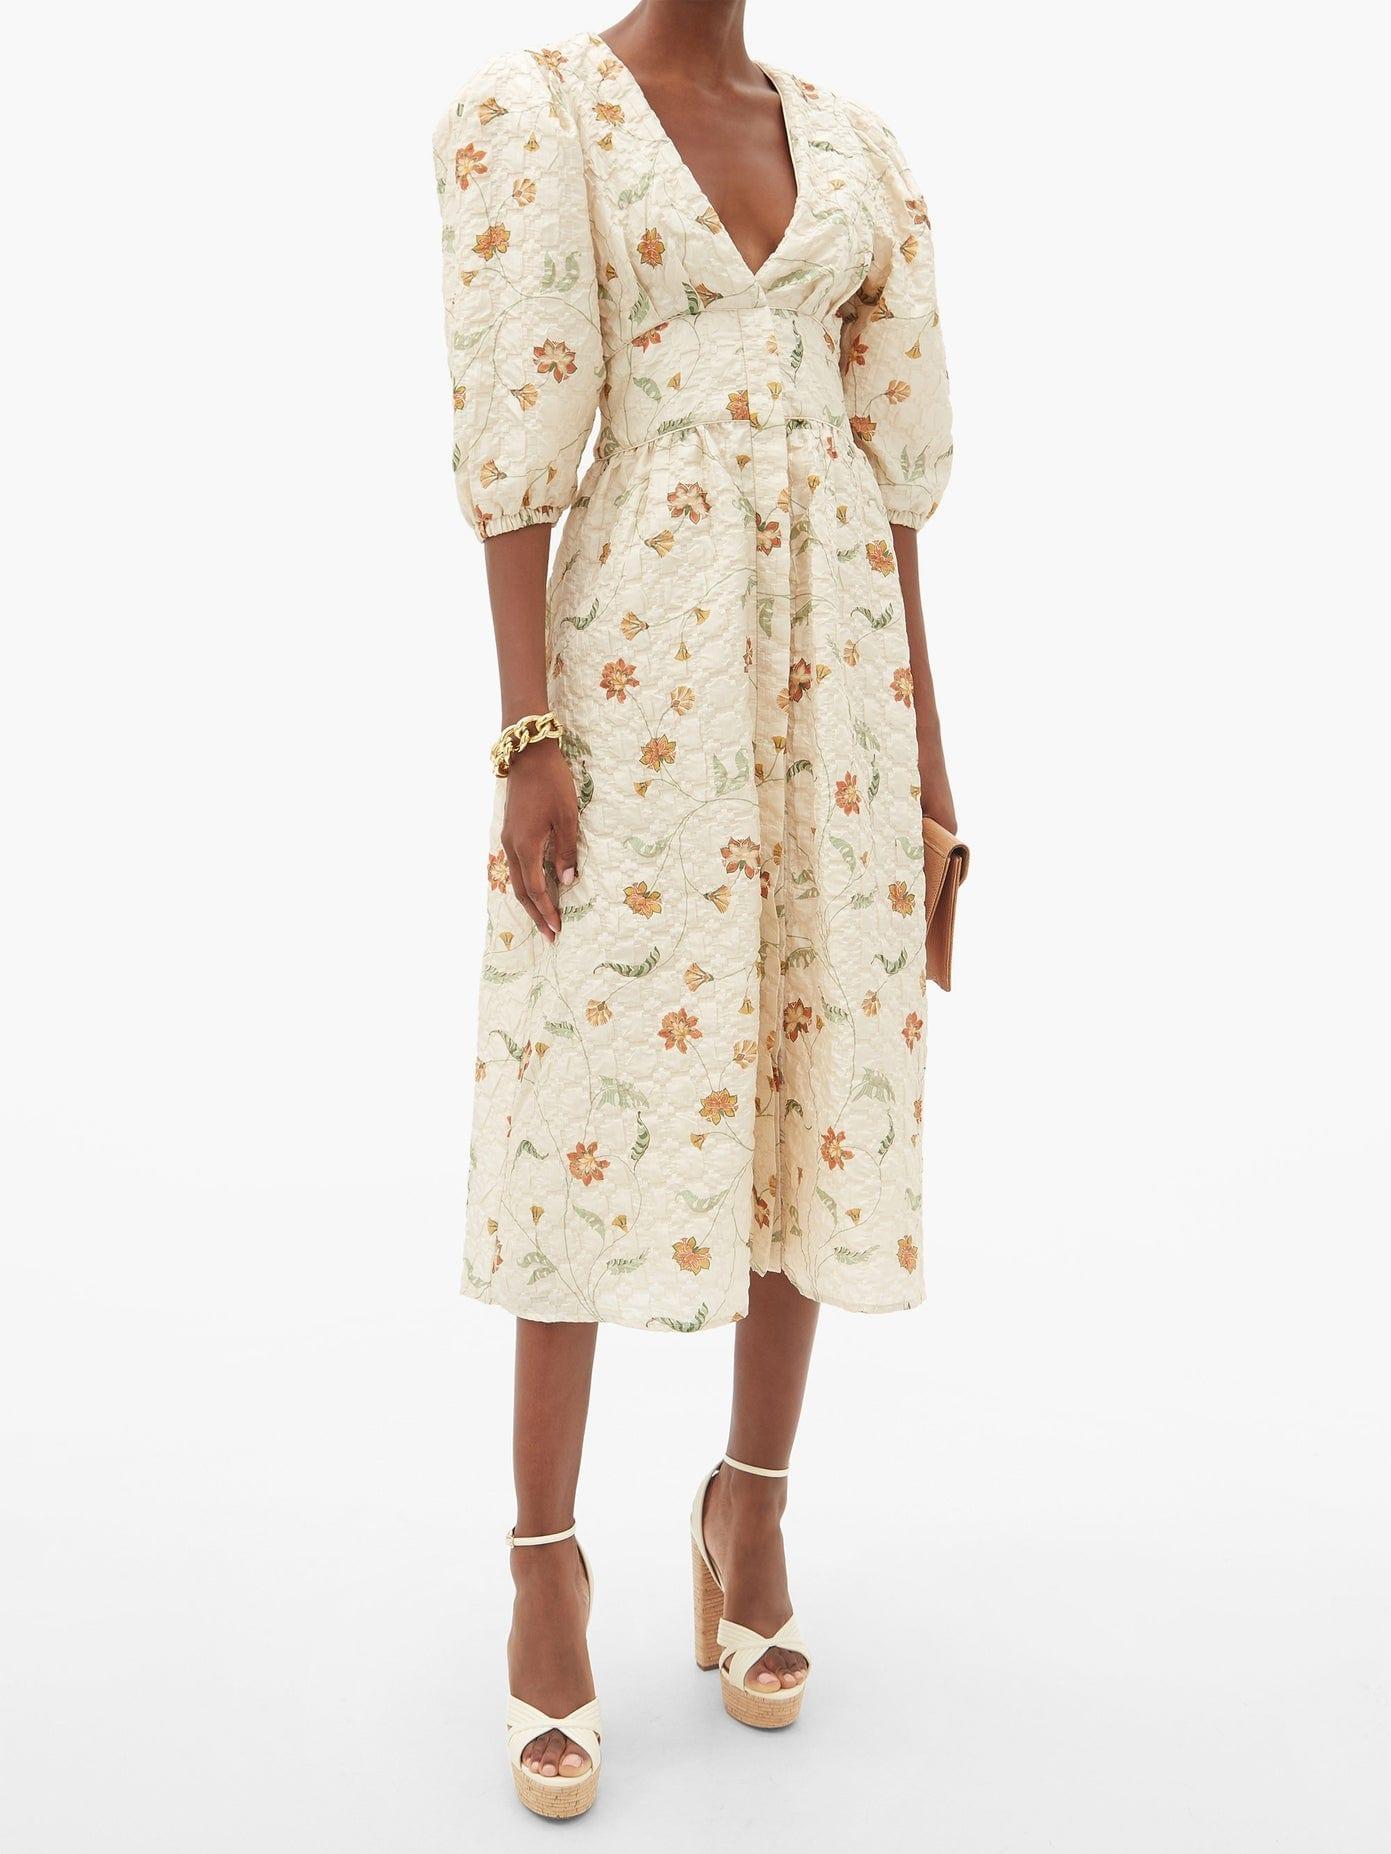 JOHANNA ORTIZ A Taste Of Wonder Silk-blend Matelassé Midi Dress